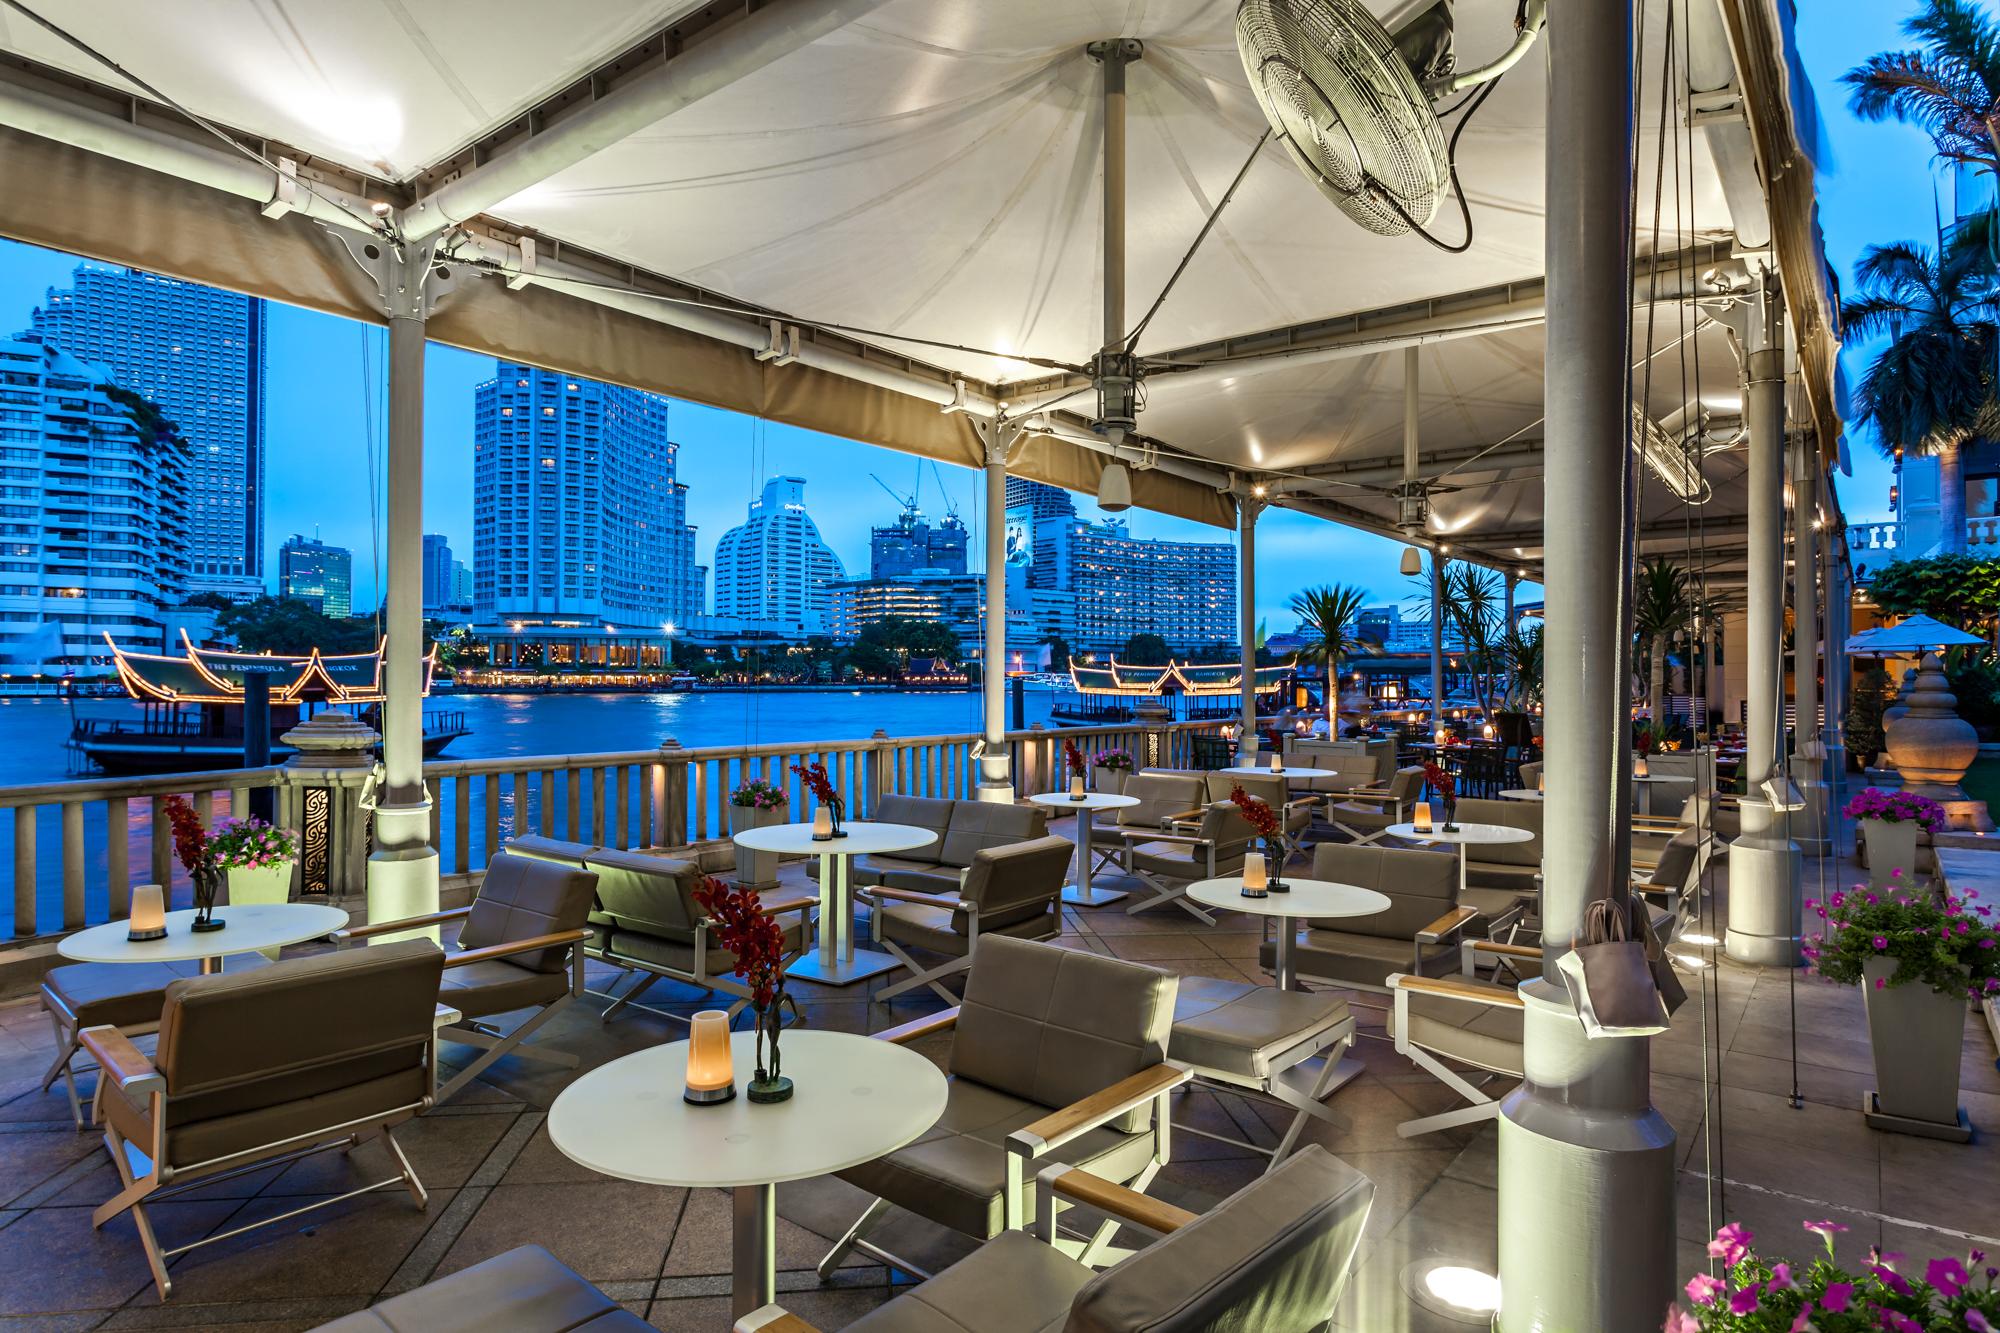 Dining room of River Café & Terrace at The Peninsula Bangkok